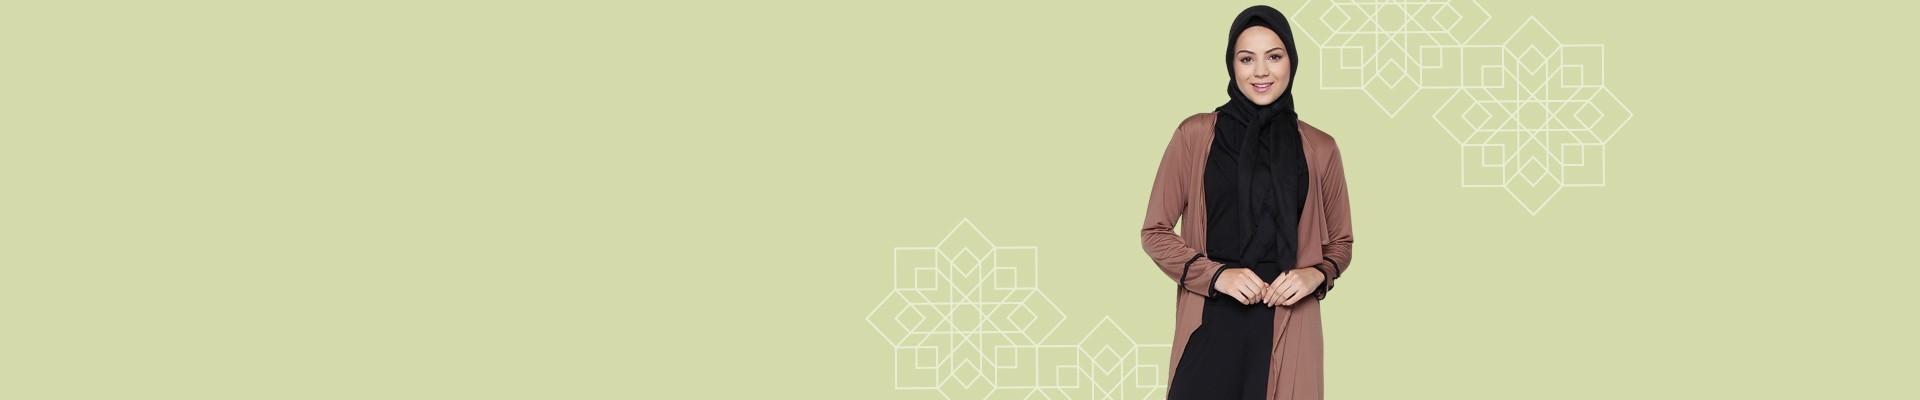 Jual Outerwear Muslim - Beli Outerwear Muslimah Terbaru